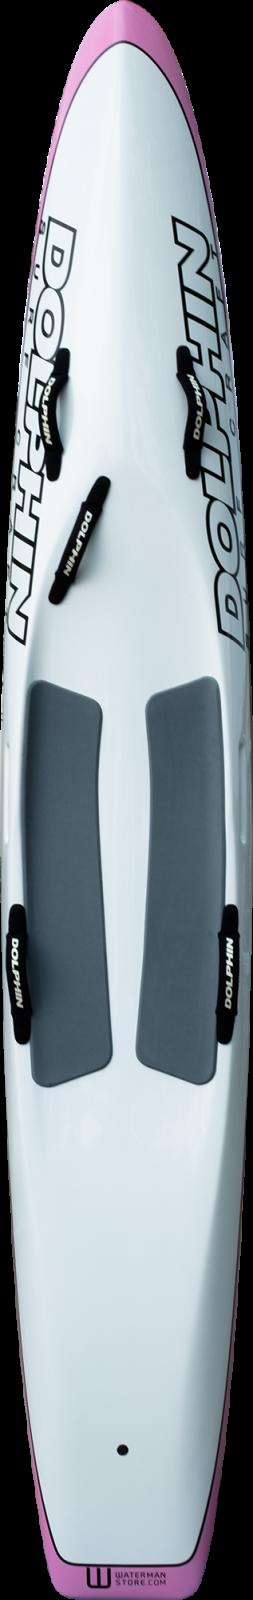 Dolphin 10'6 L - 360